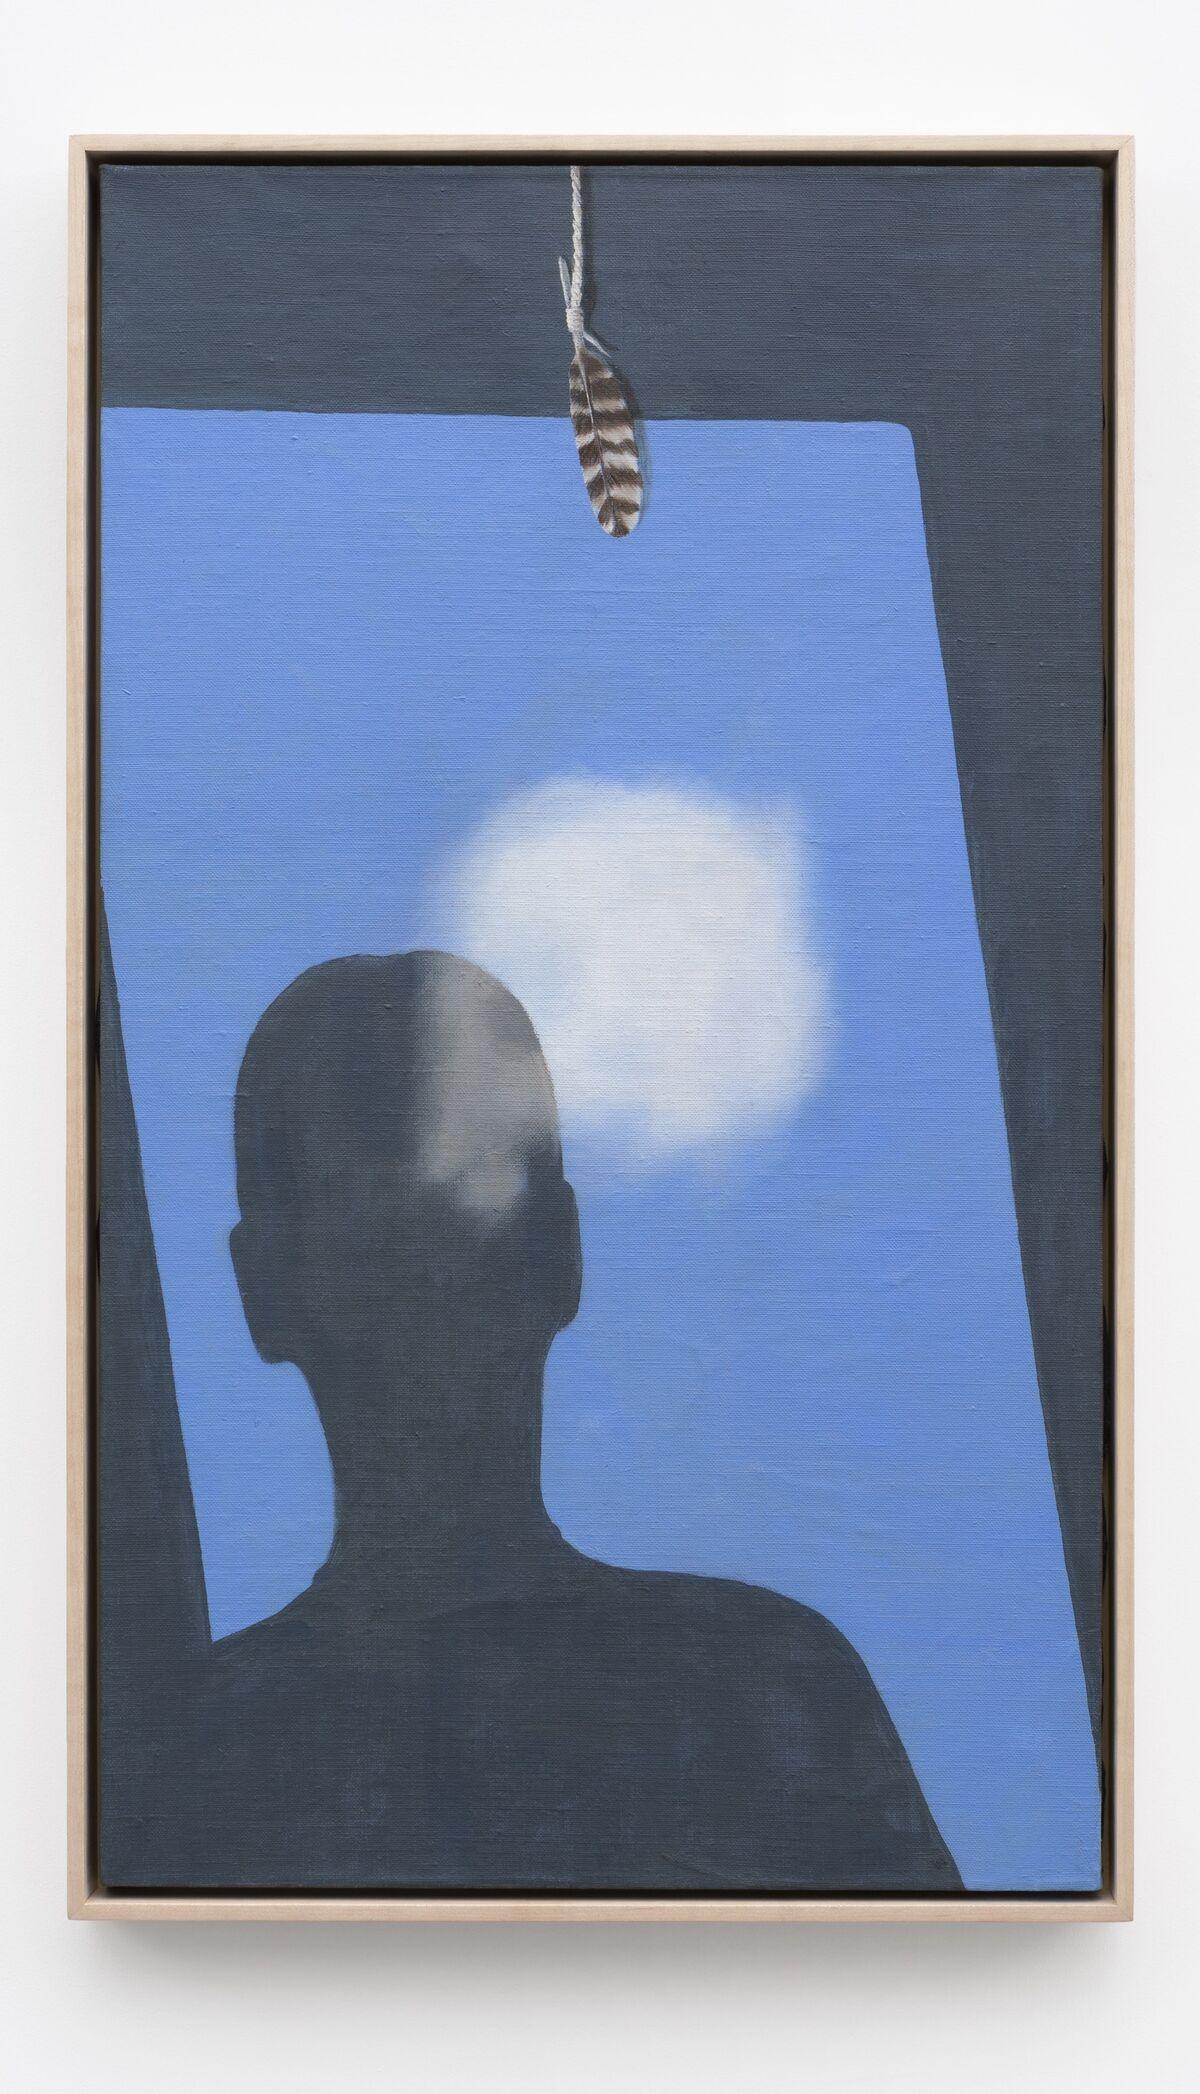 Luchita Hurtado, Untitled, 1972. Courtesy of Hauser & Wirth.